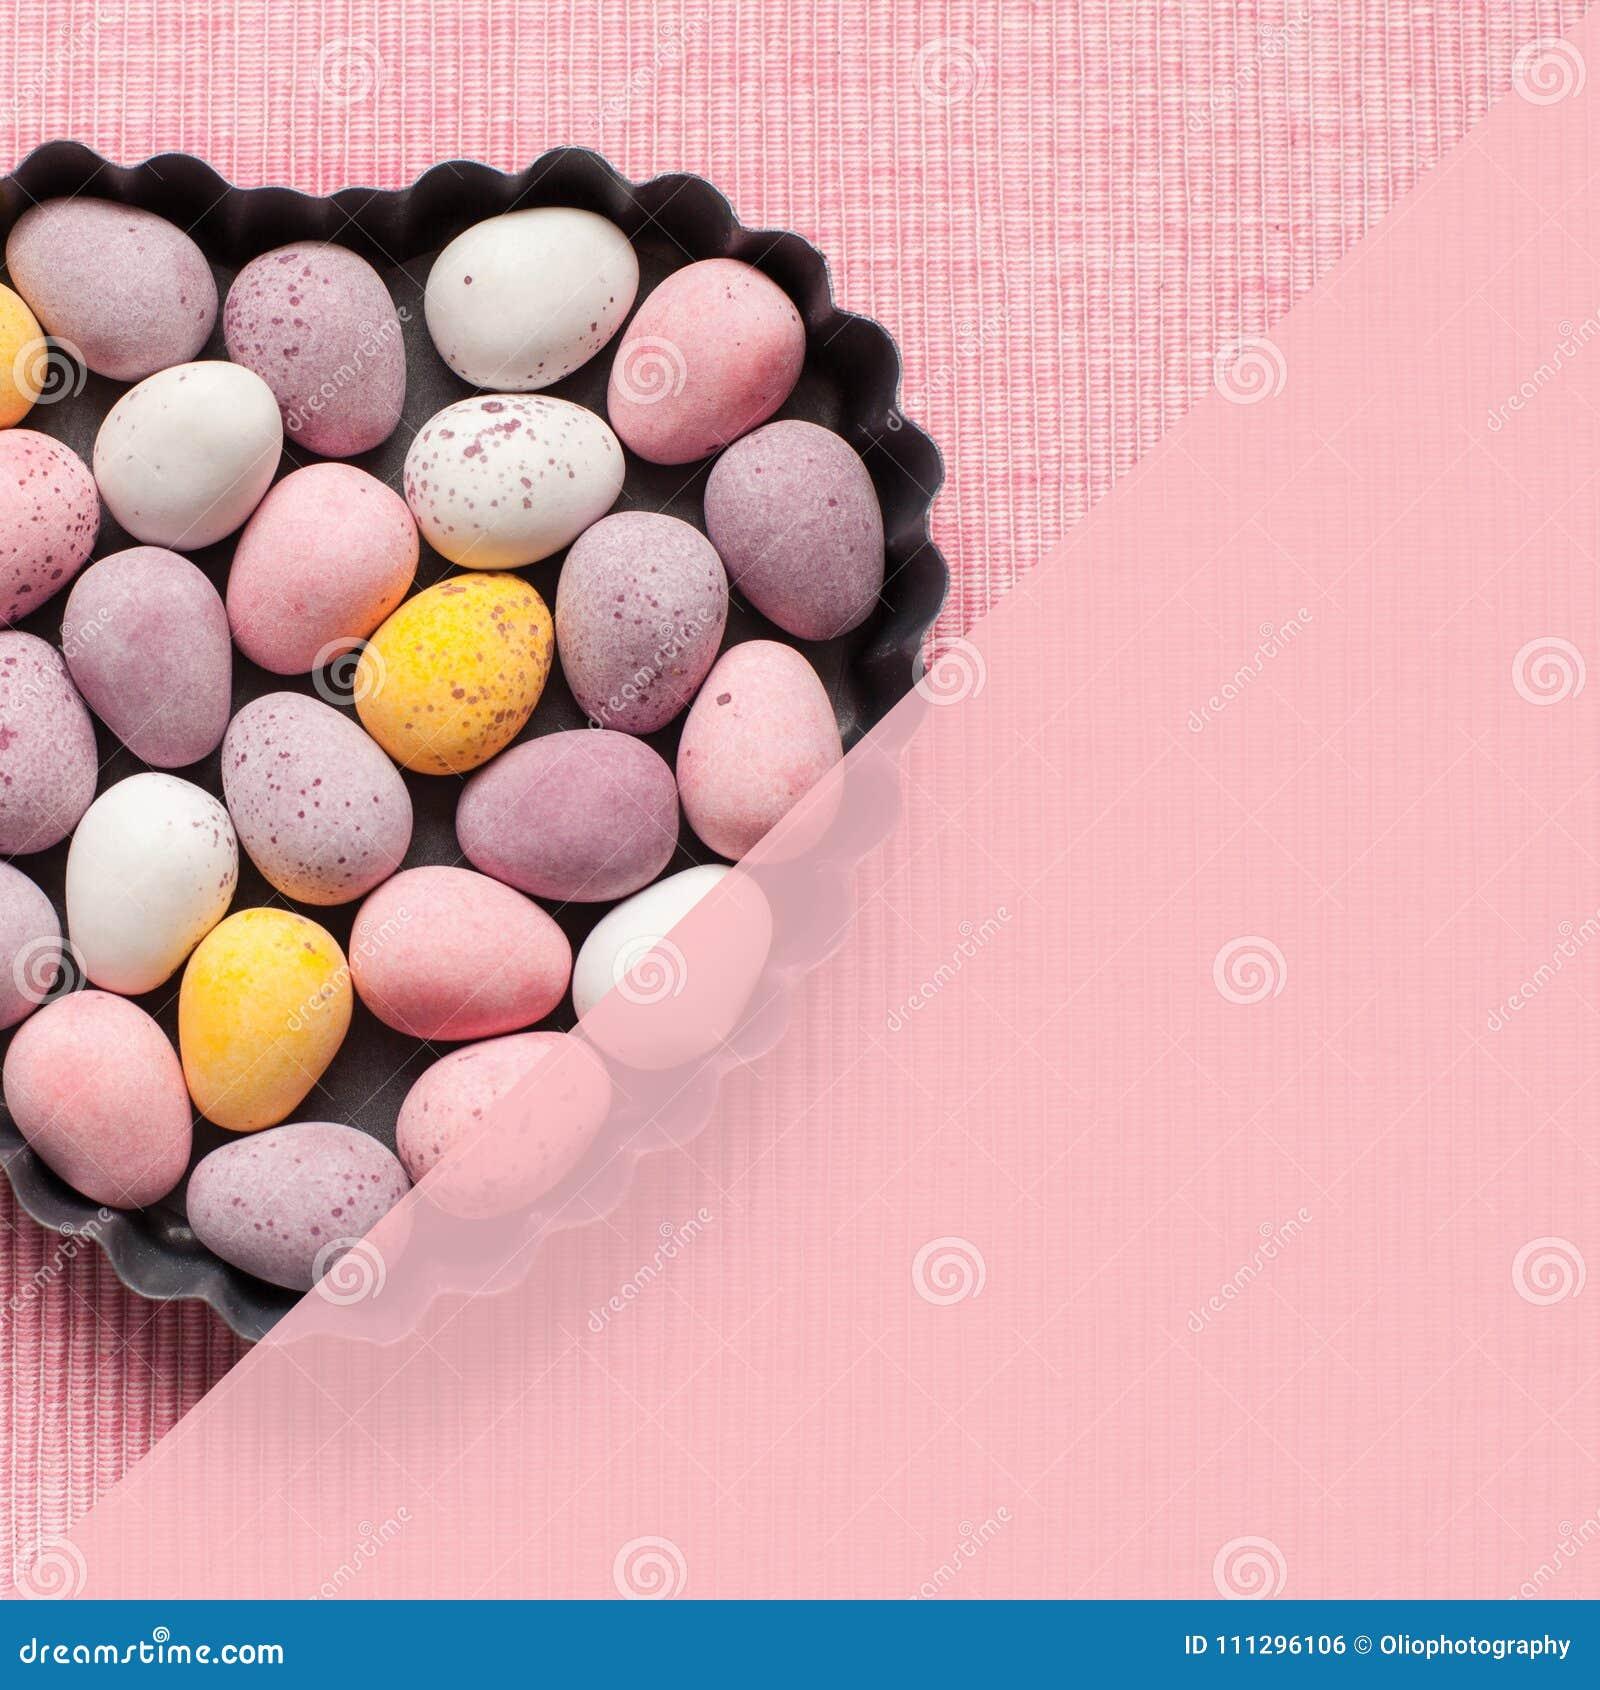 Square Social Media Easter Template